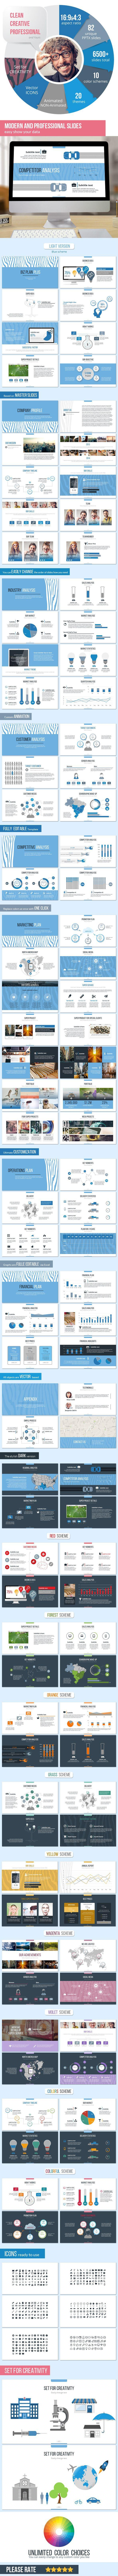 Business Plan+ PowerPoint Presentation Template (PowerPoint Templates)